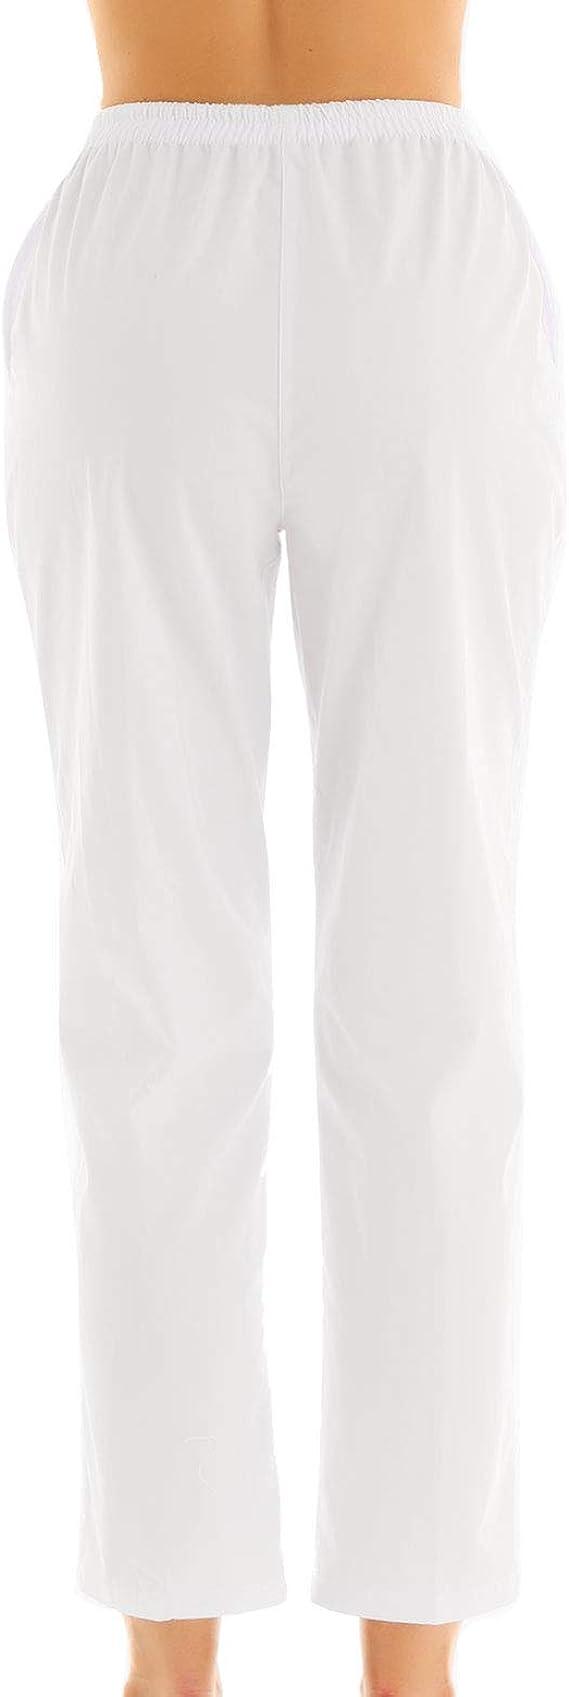 Freebily Unisex Uniforme Pantalón Sanitario de Trabajo Cintura ...